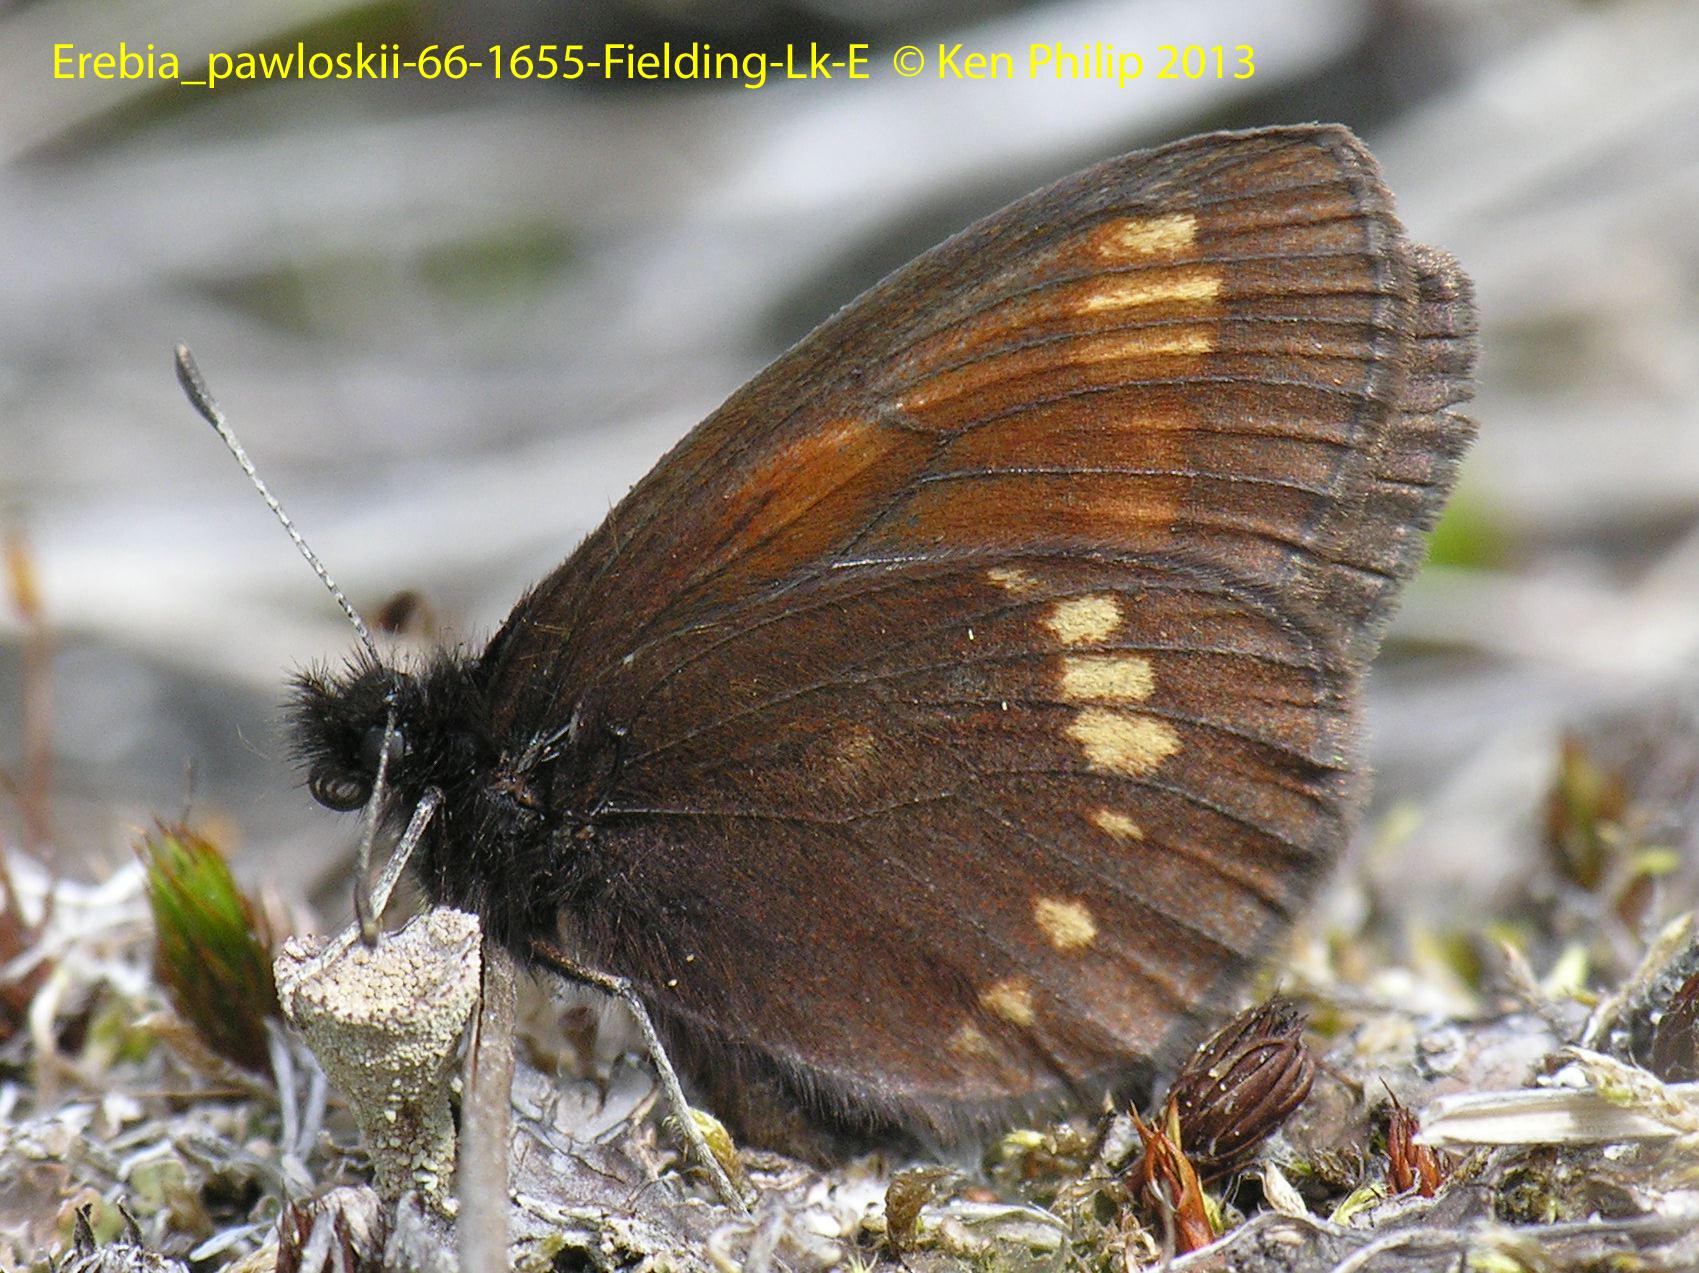 68-Erebia_pawloskii-66-1655-Fielding-Lk-E._theano